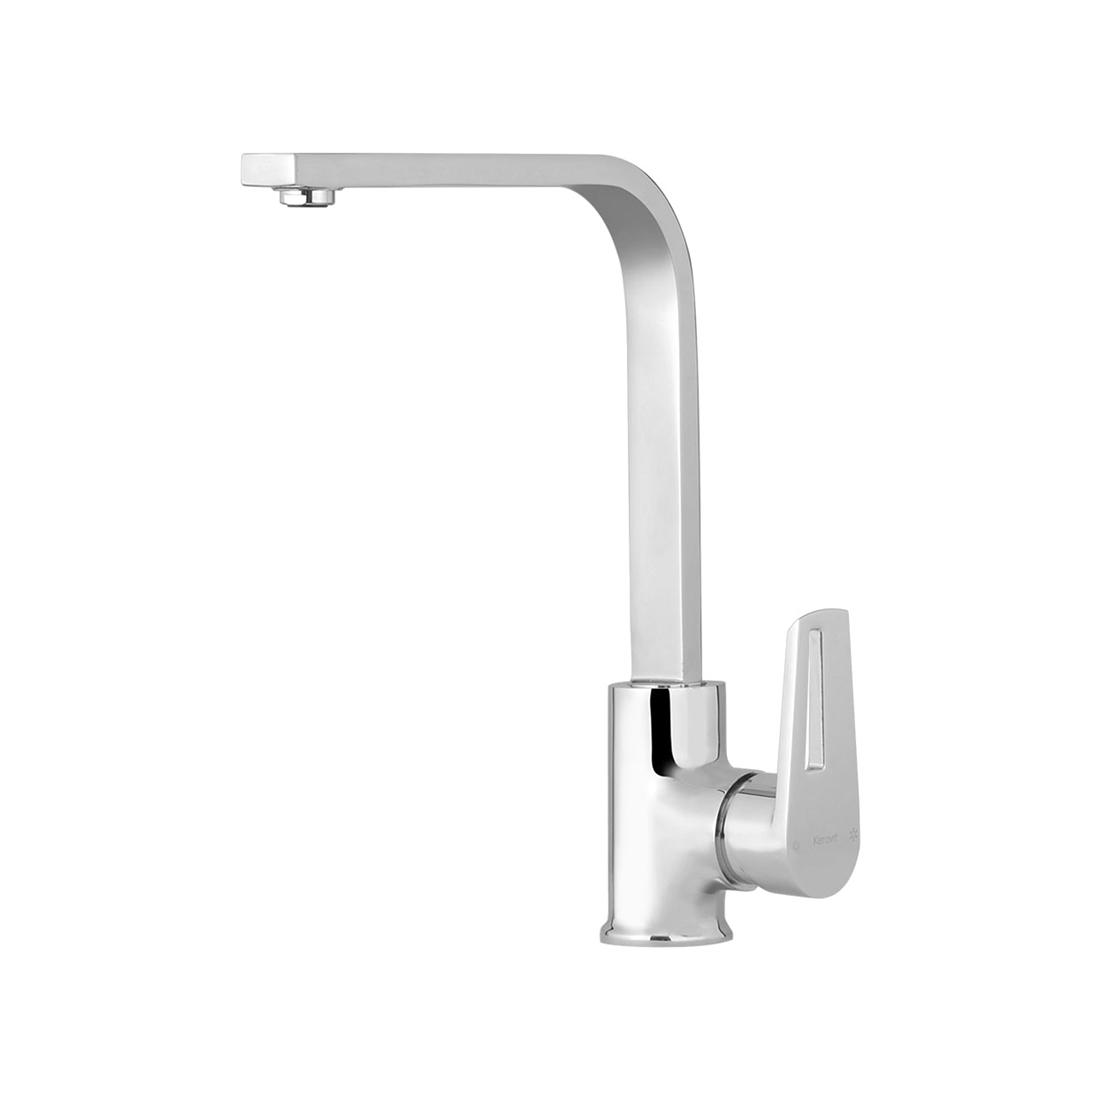 Kerovit Chime KB911047 Single Lever Sink Mixer With Swivel Spout